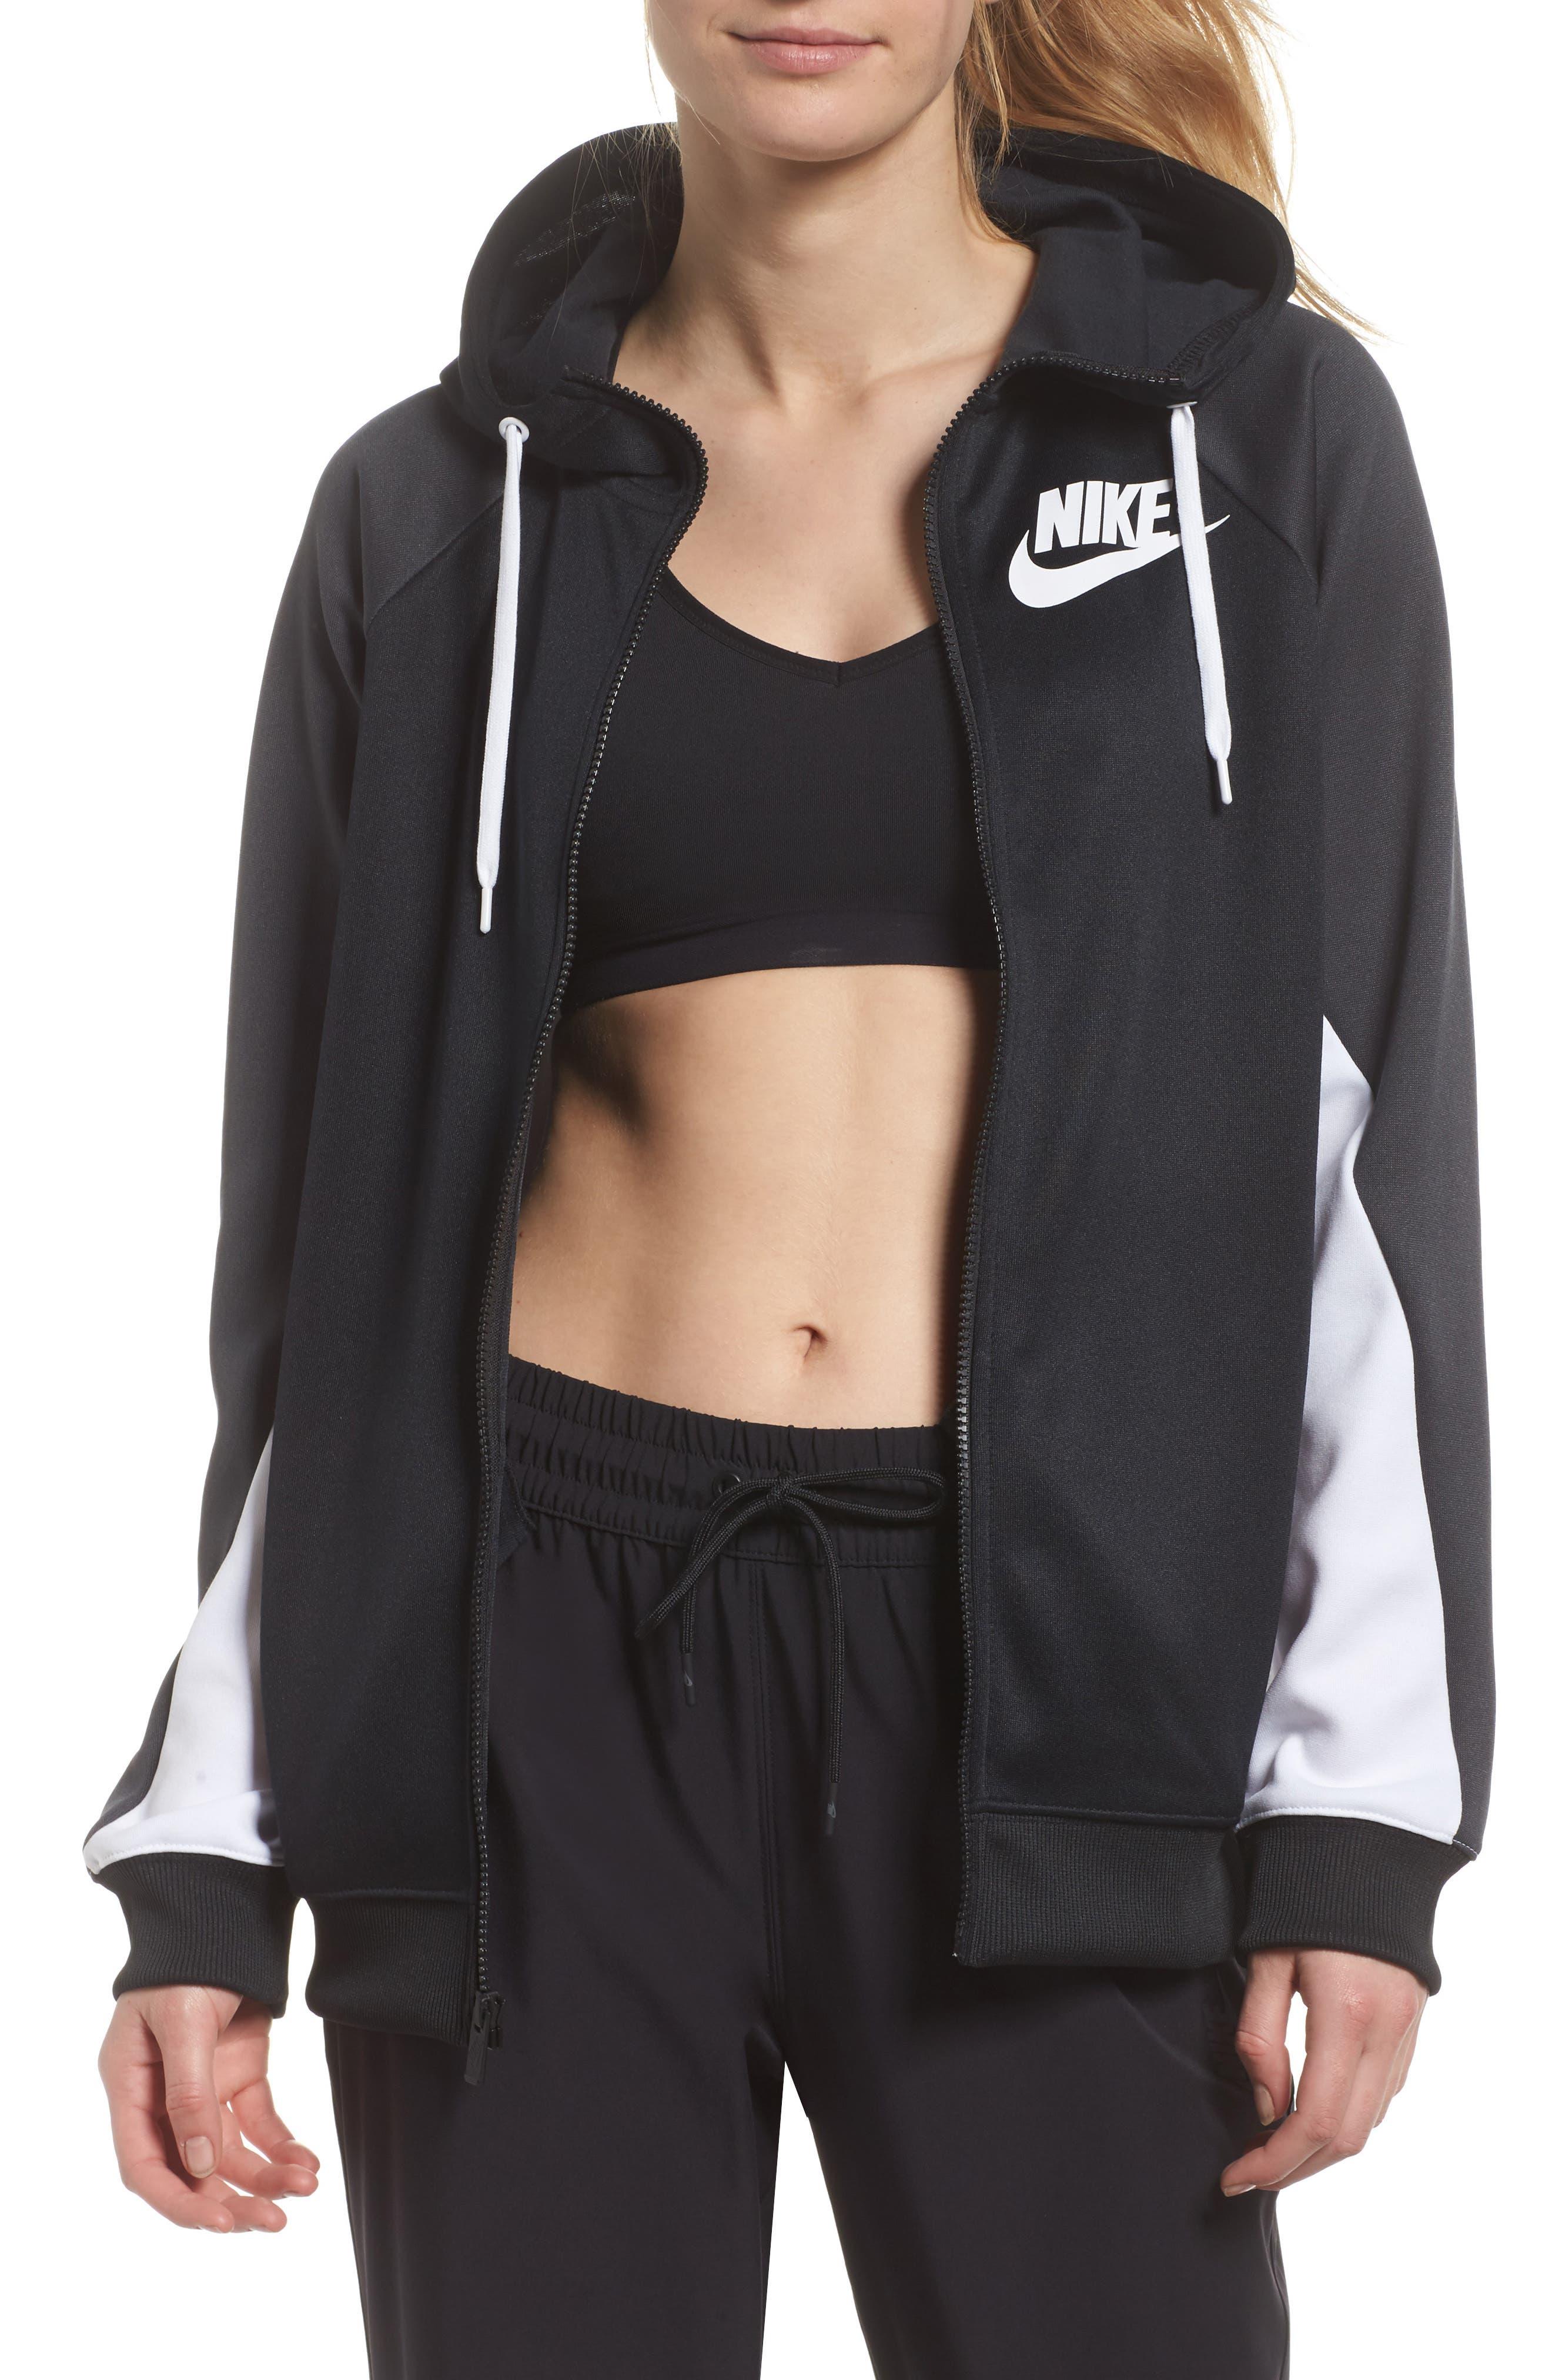 Sportswear Women's Zip Hoodie,                             Alternate thumbnail 2, color,                             010